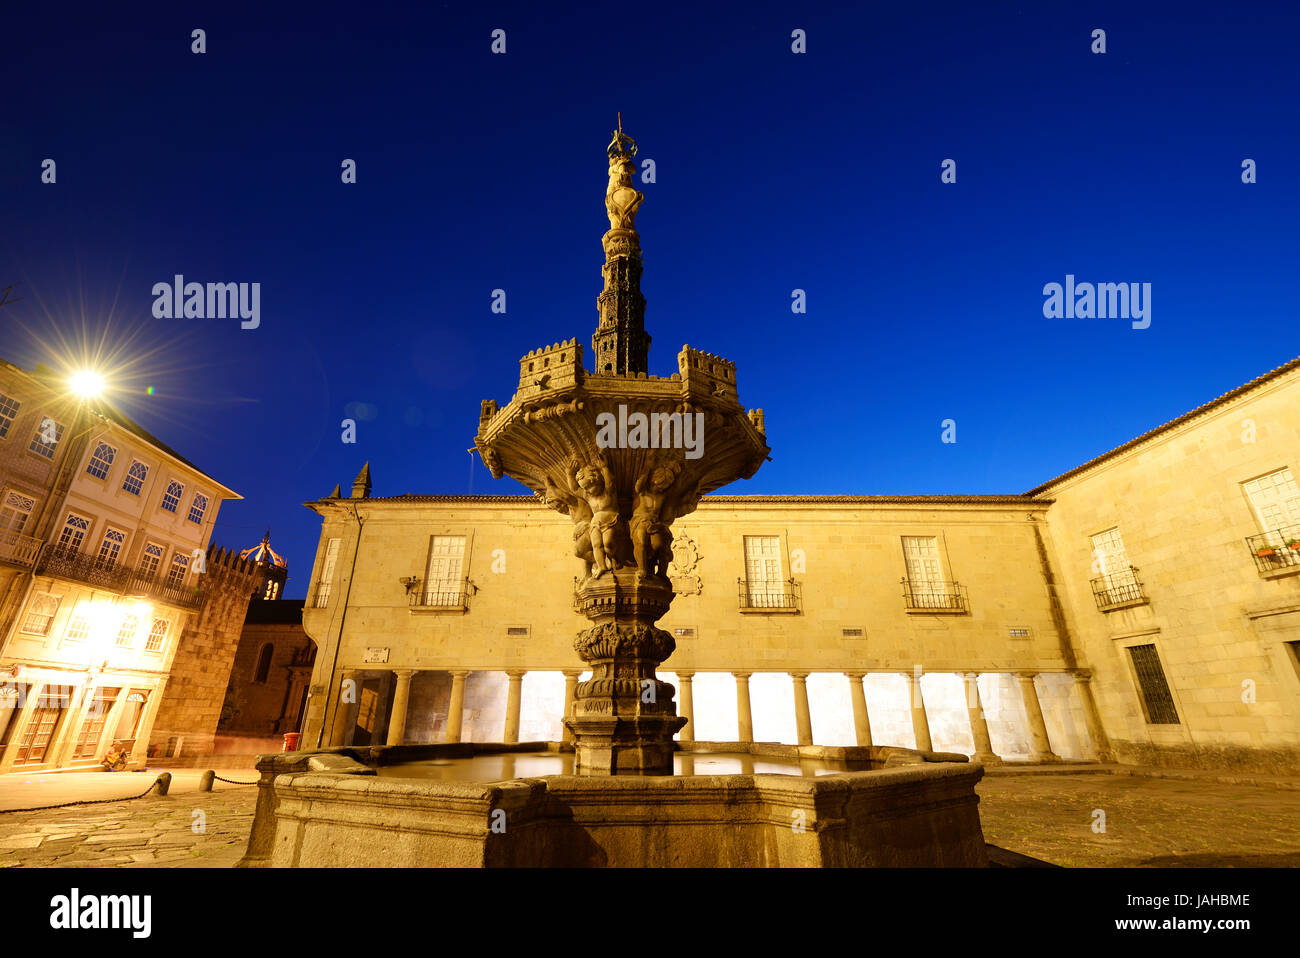 The 18th century fountain at the Largo do Paço. Braga, Portugal Stock Photo